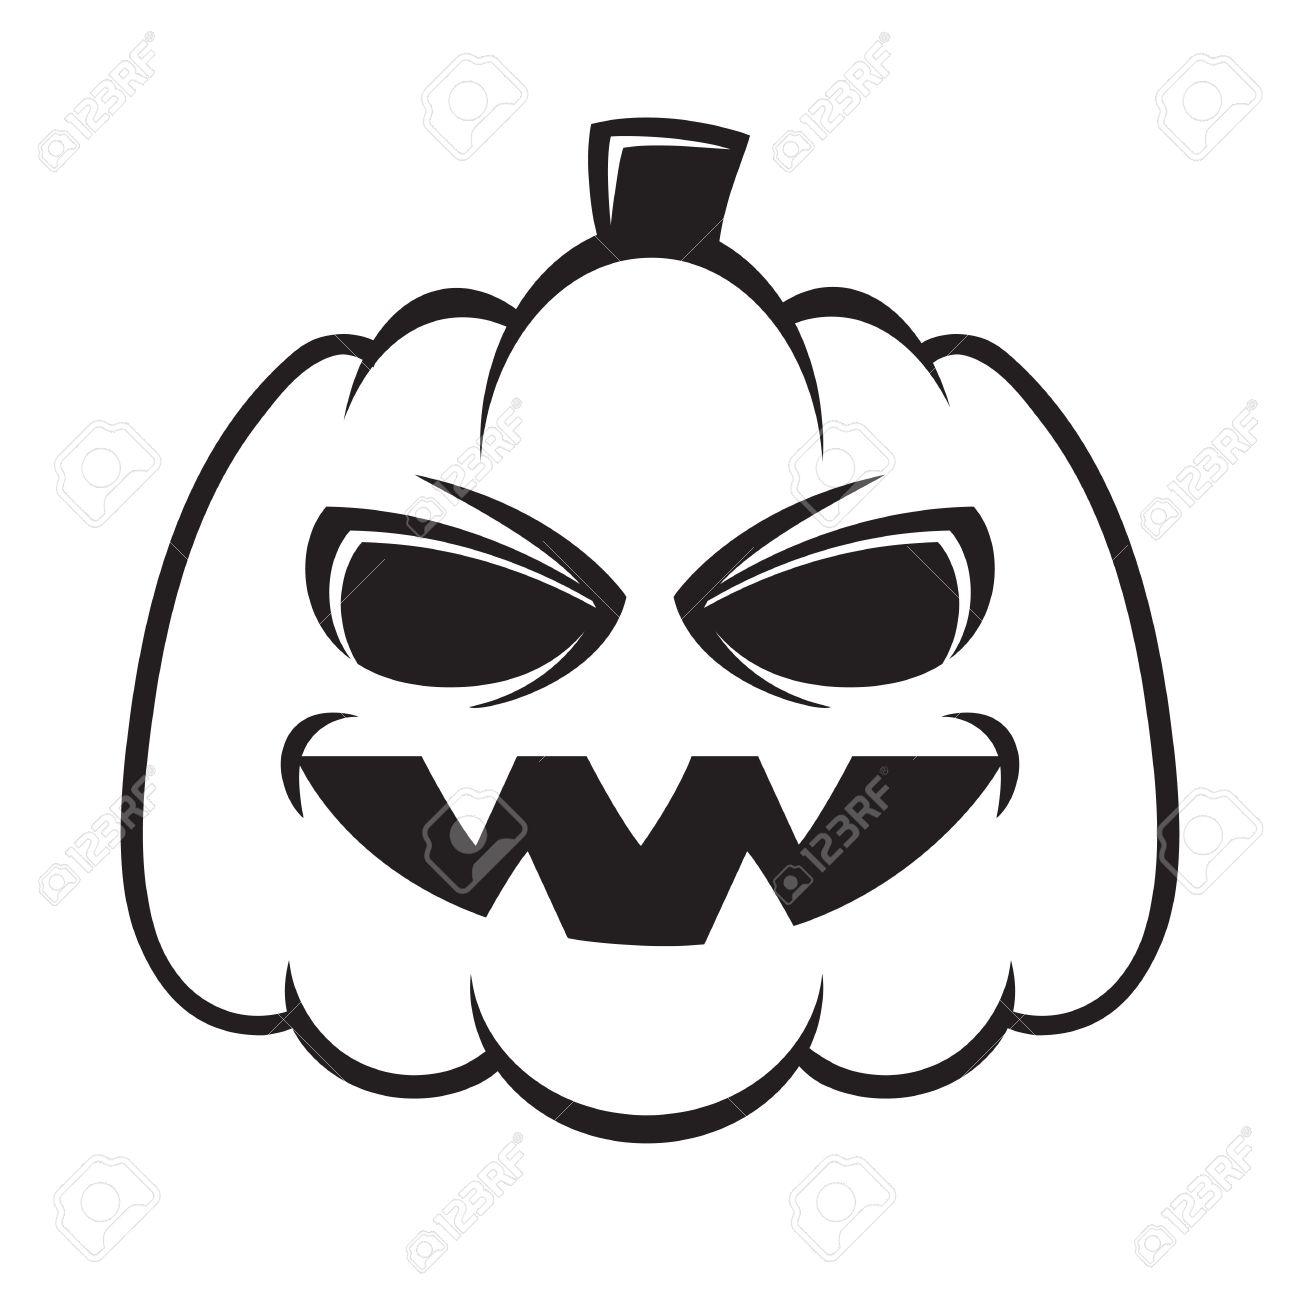 Pumpkin Image Black And White